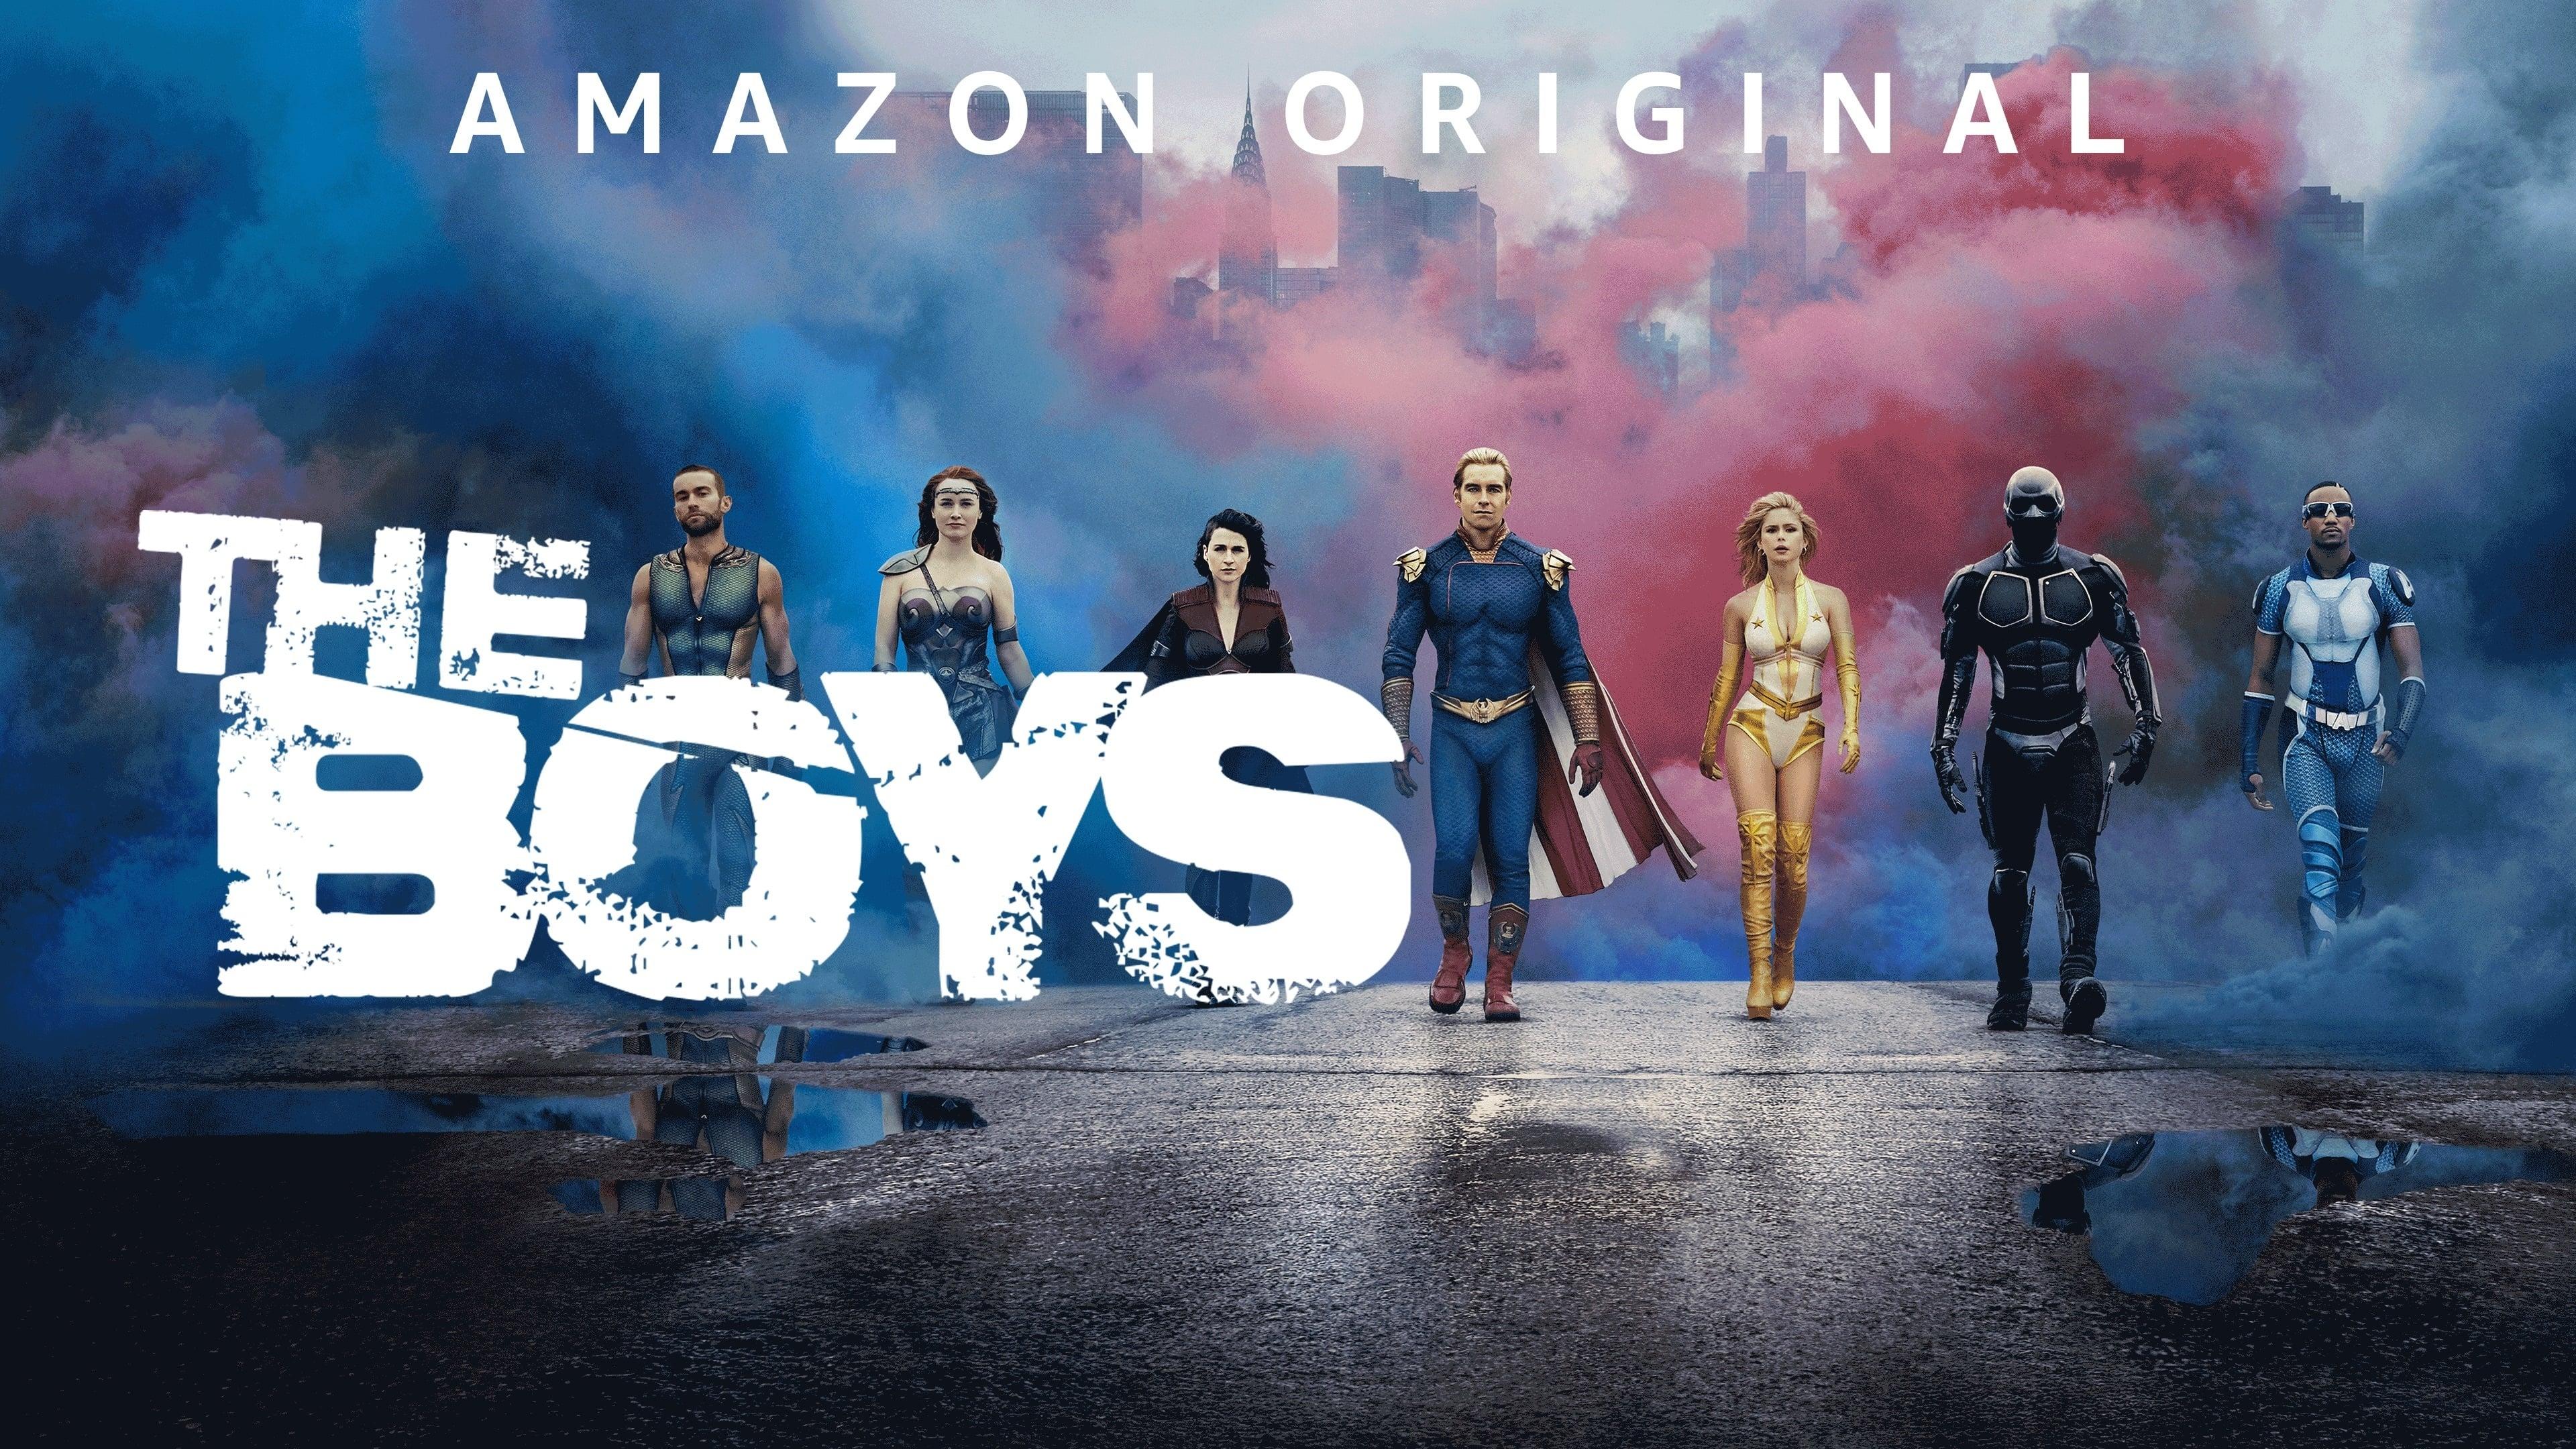 Third season The Boys will have three new superheroes